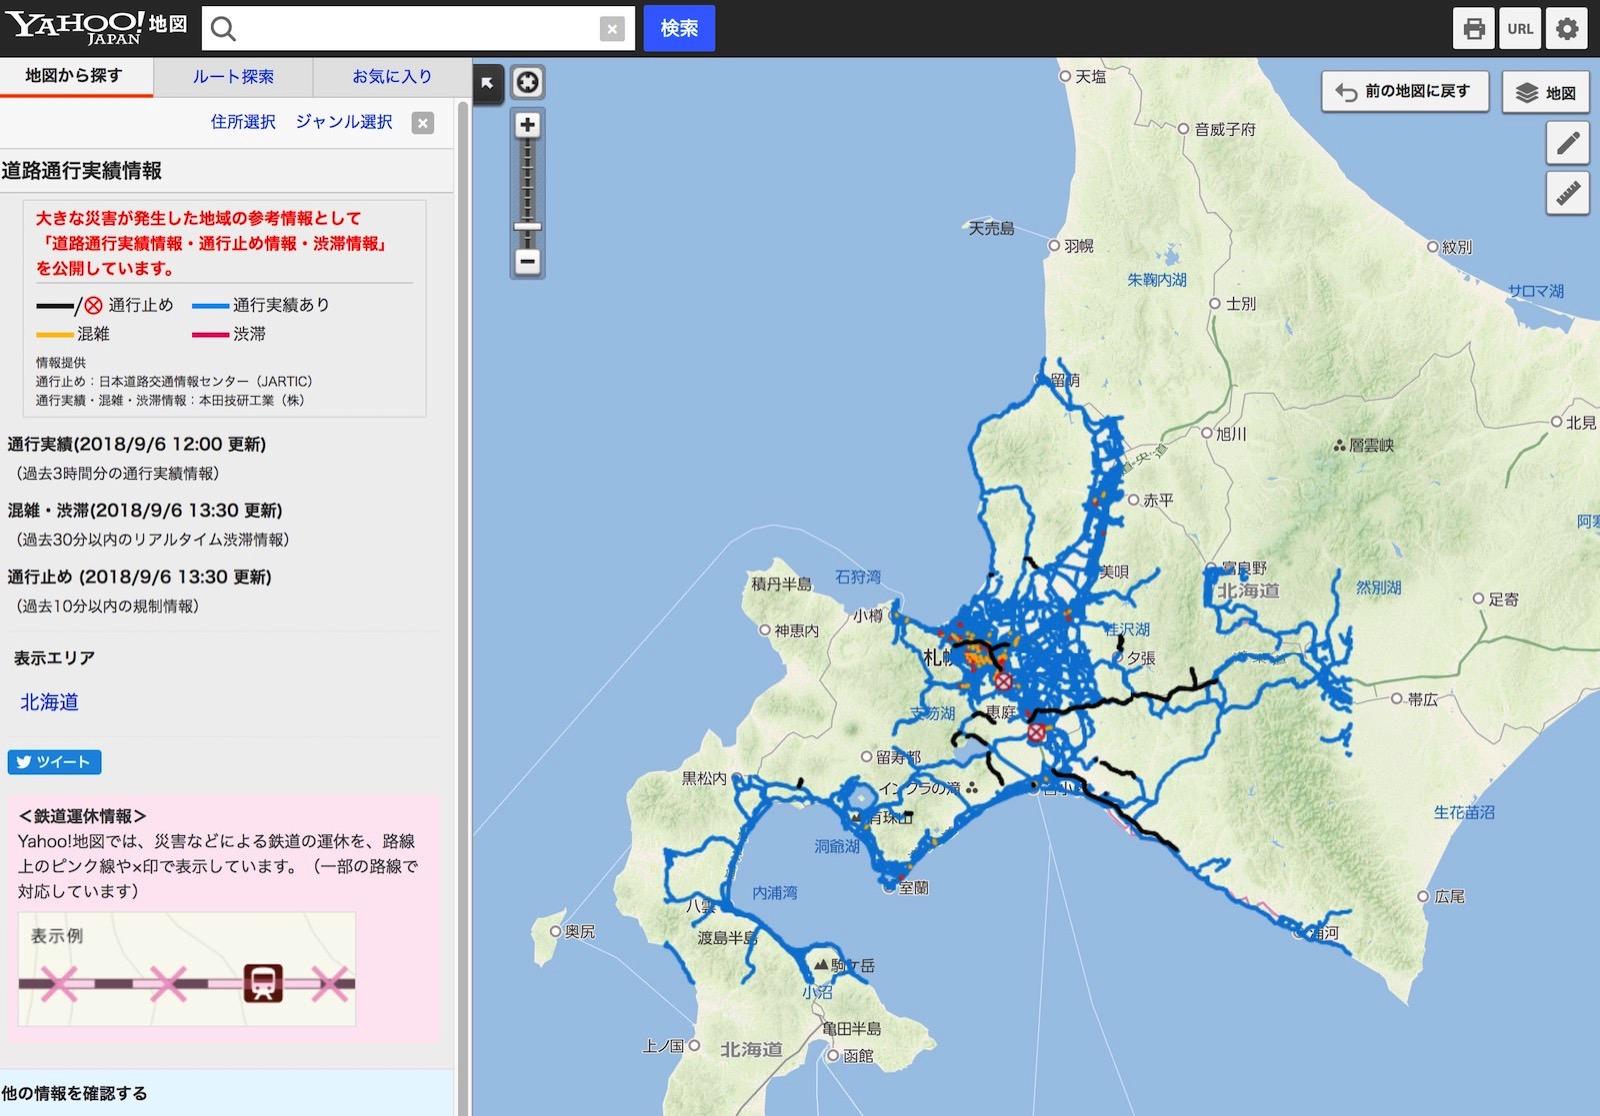 Yahoo Maps Hokkaido